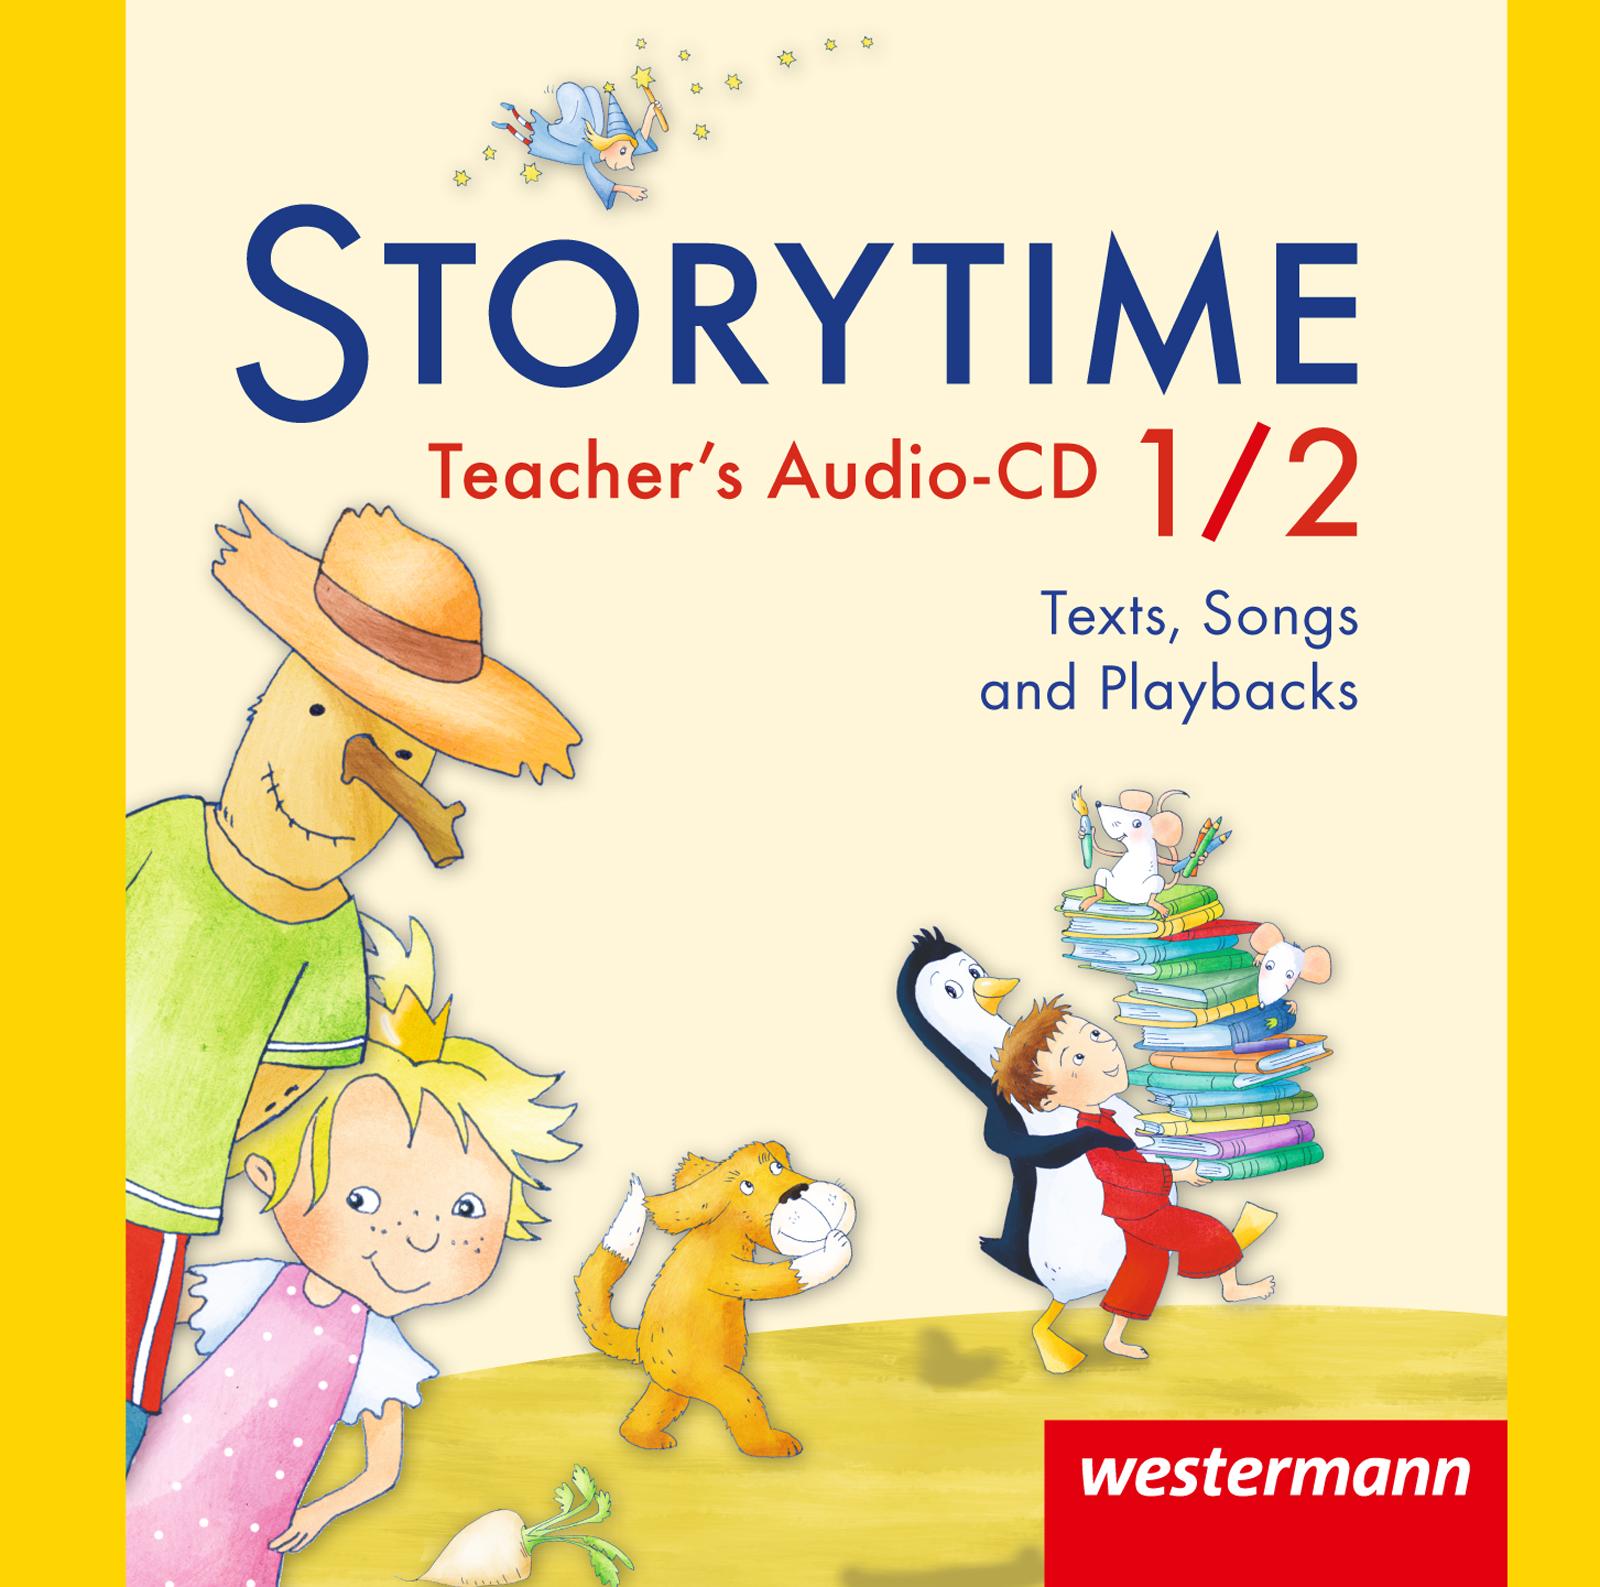 Storytime 1 / 2. Audio-CD,